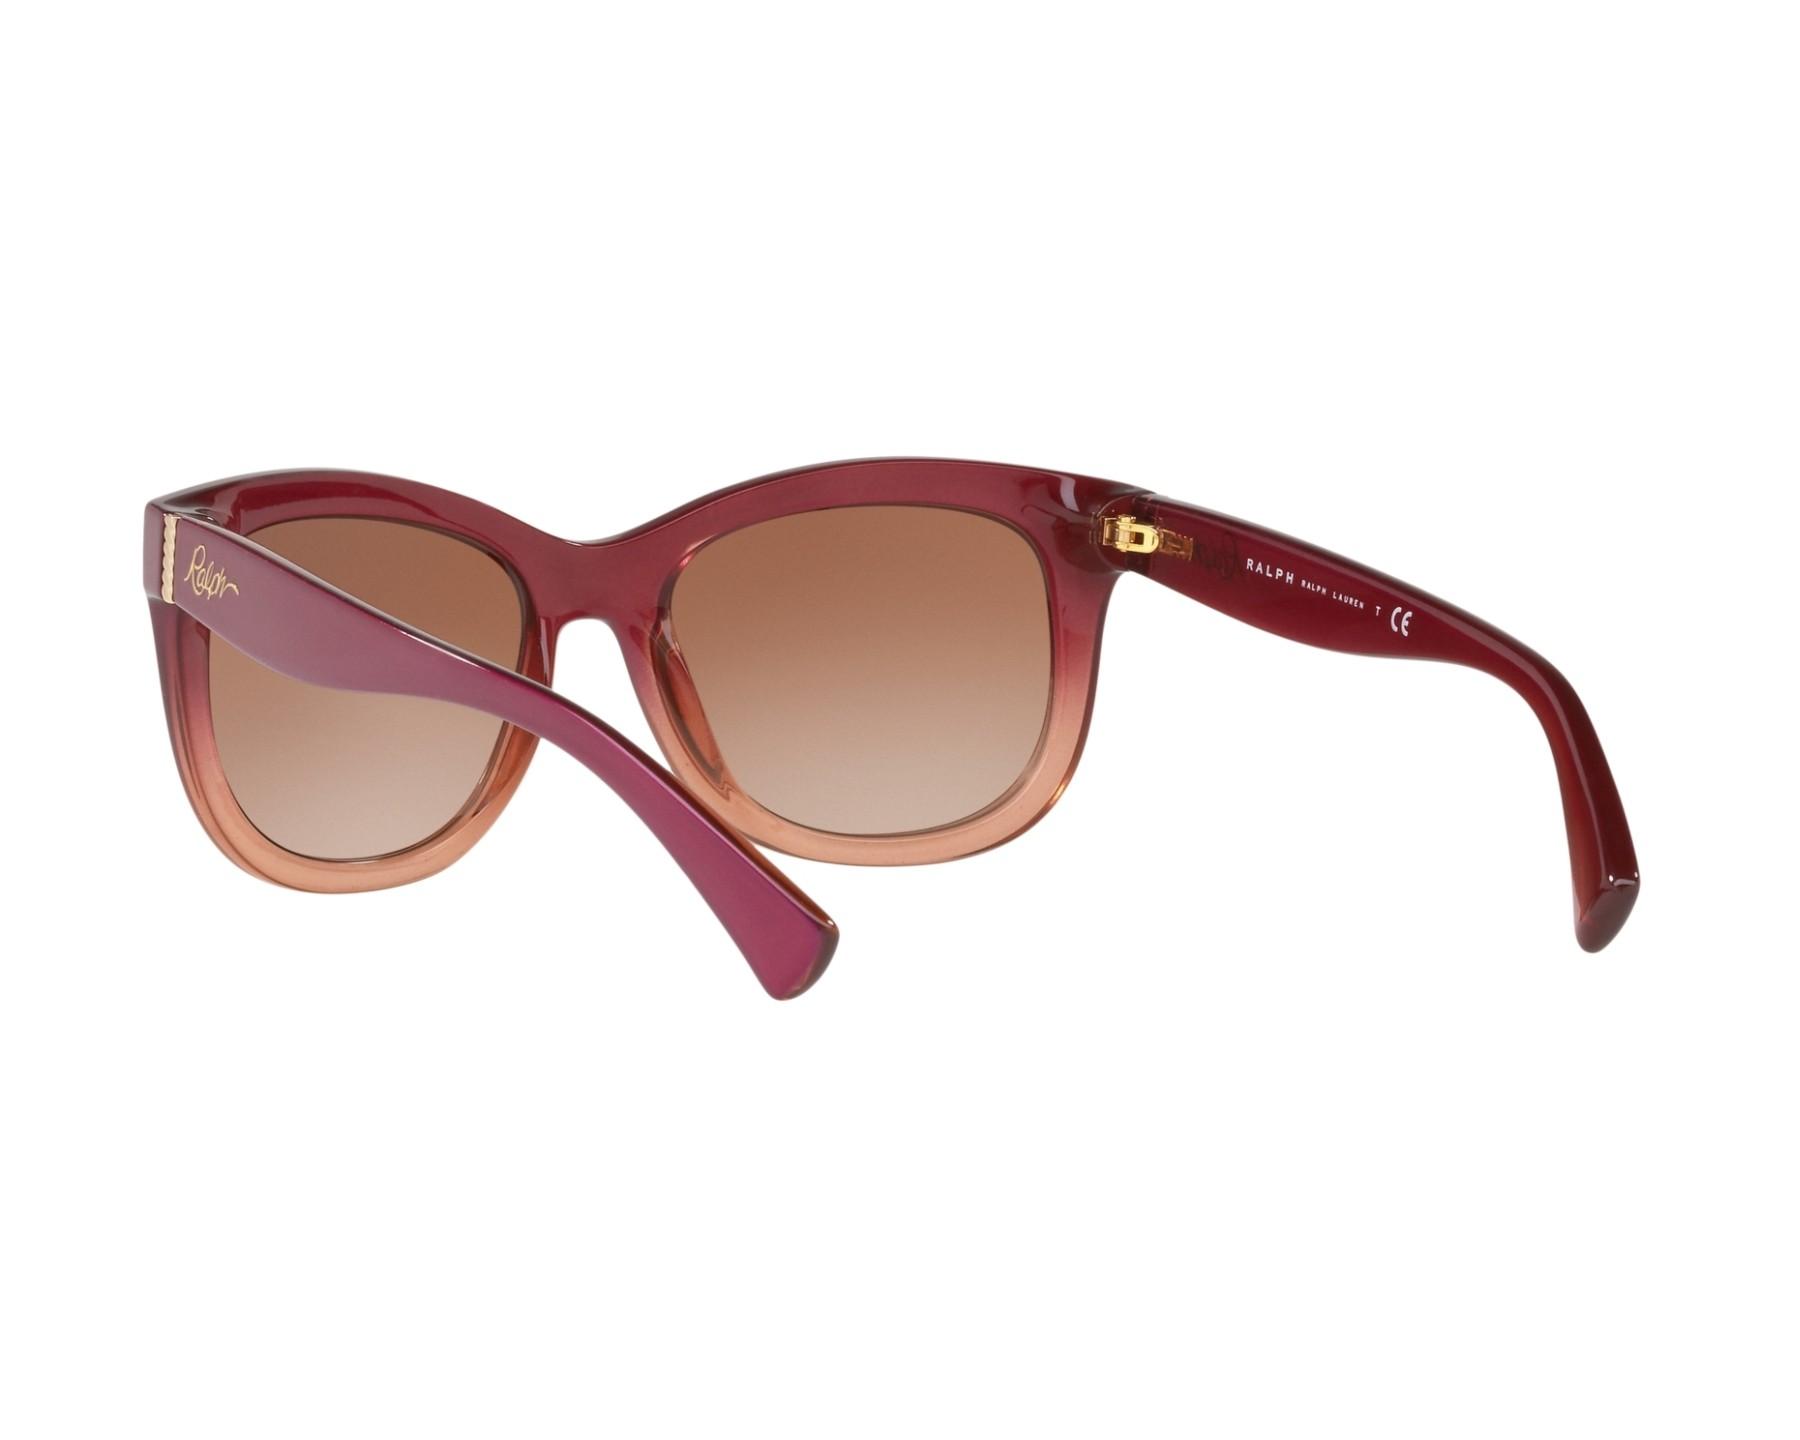 lunettes de soleil ralph by ralph lauren ra 5234 167713. Black Bedroom Furniture Sets. Home Design Ideas